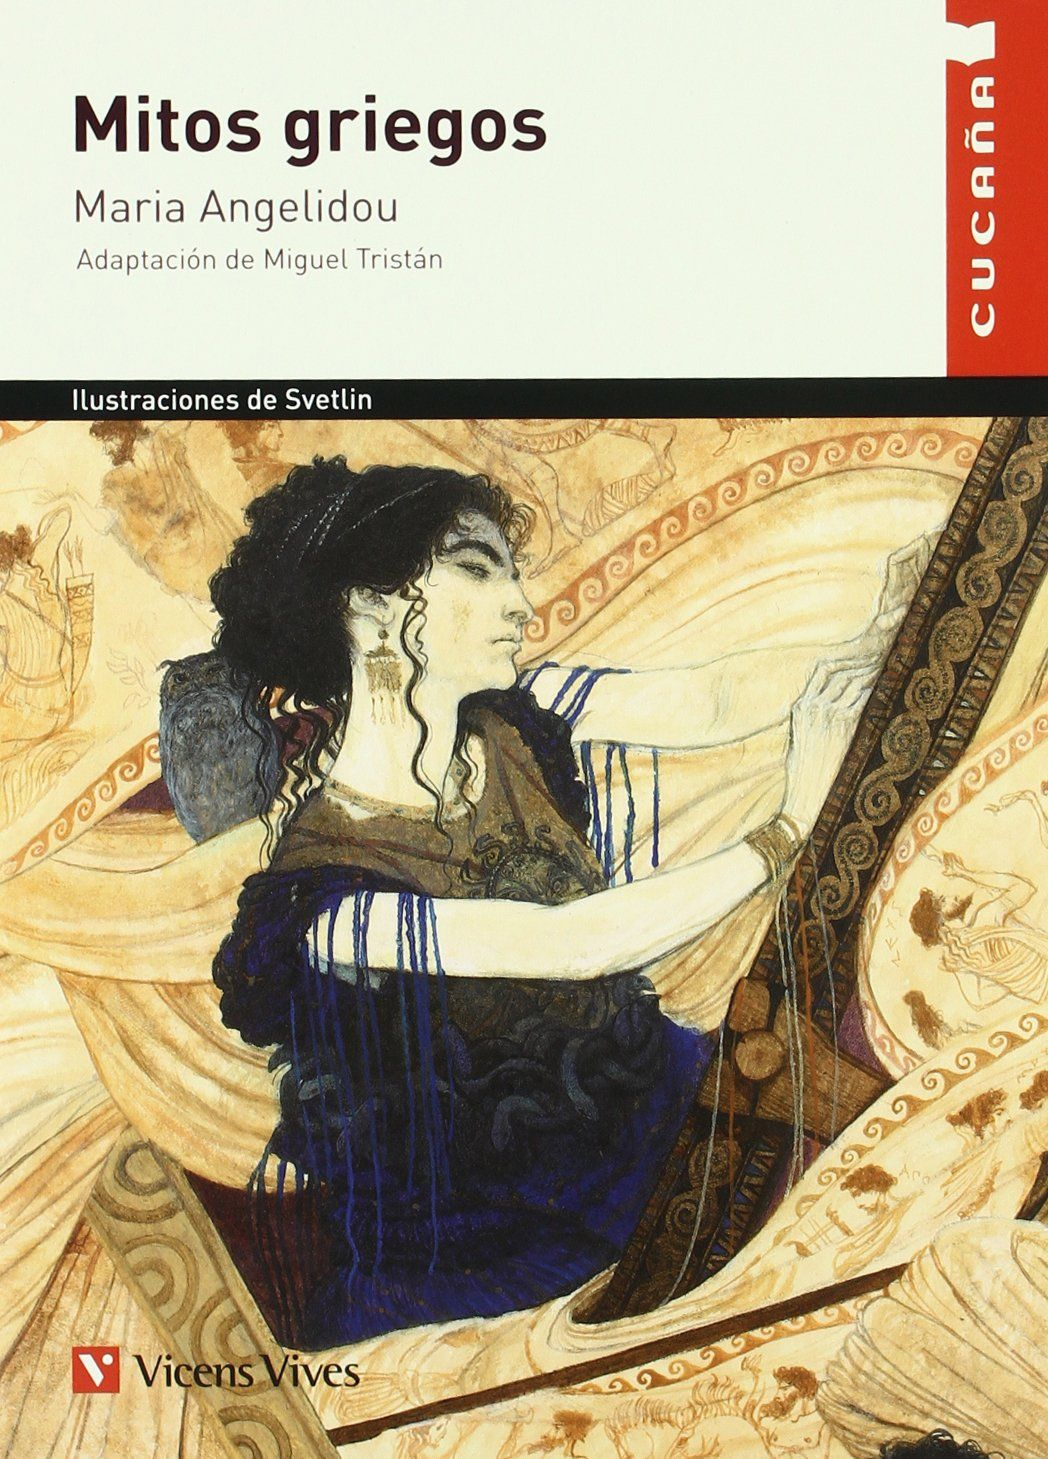 mitos griegos vicens vives pdf gratis